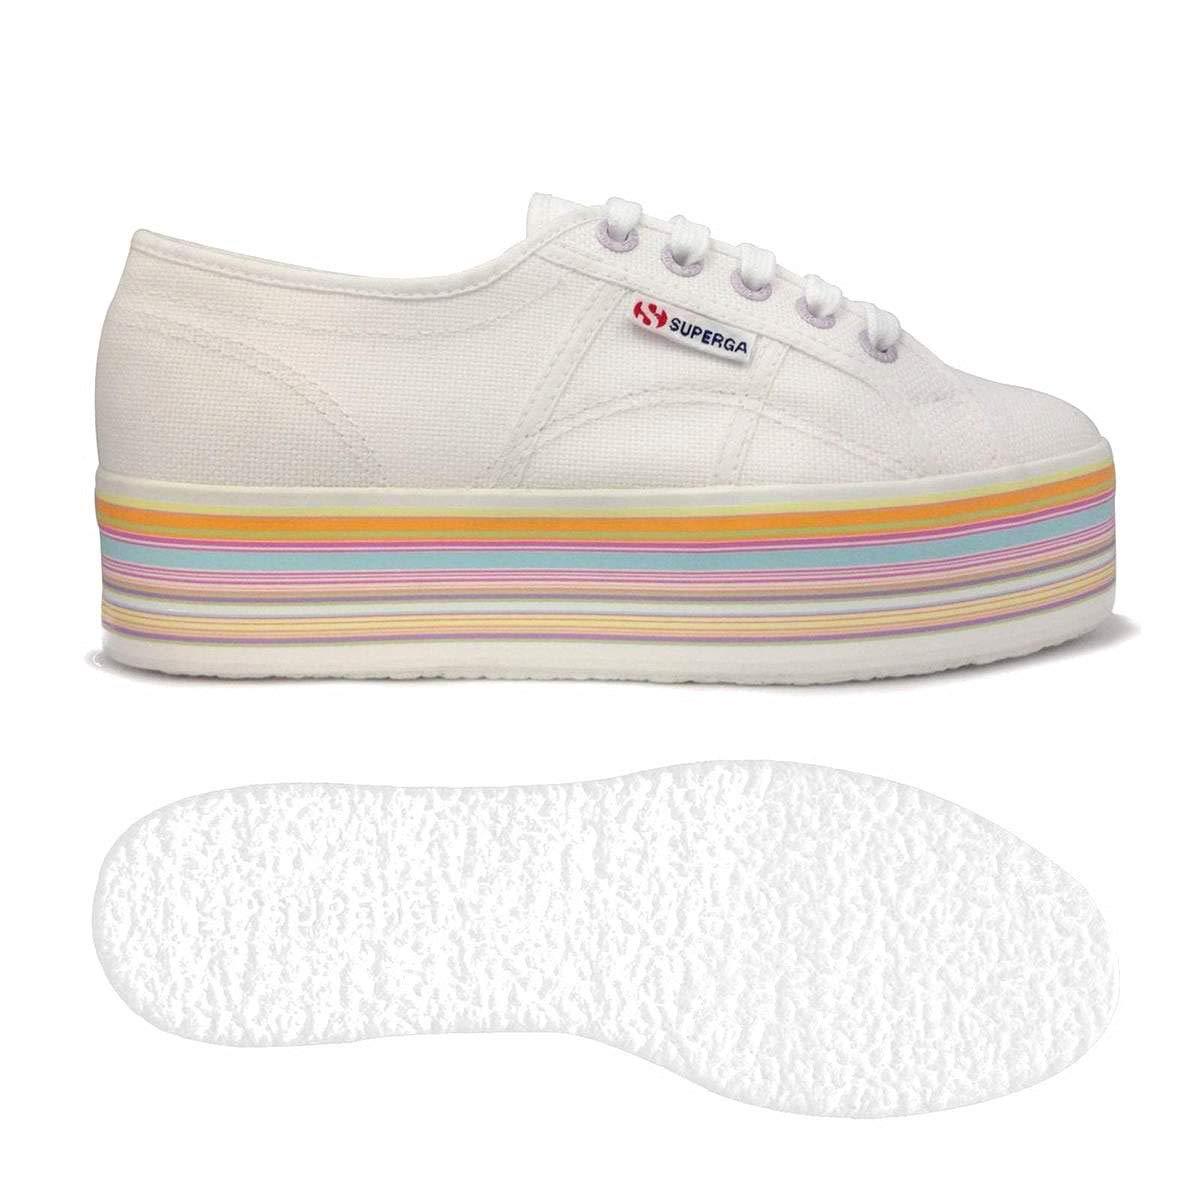 SUPERGA 2790 multicolor Cotw, Sneaker Donna